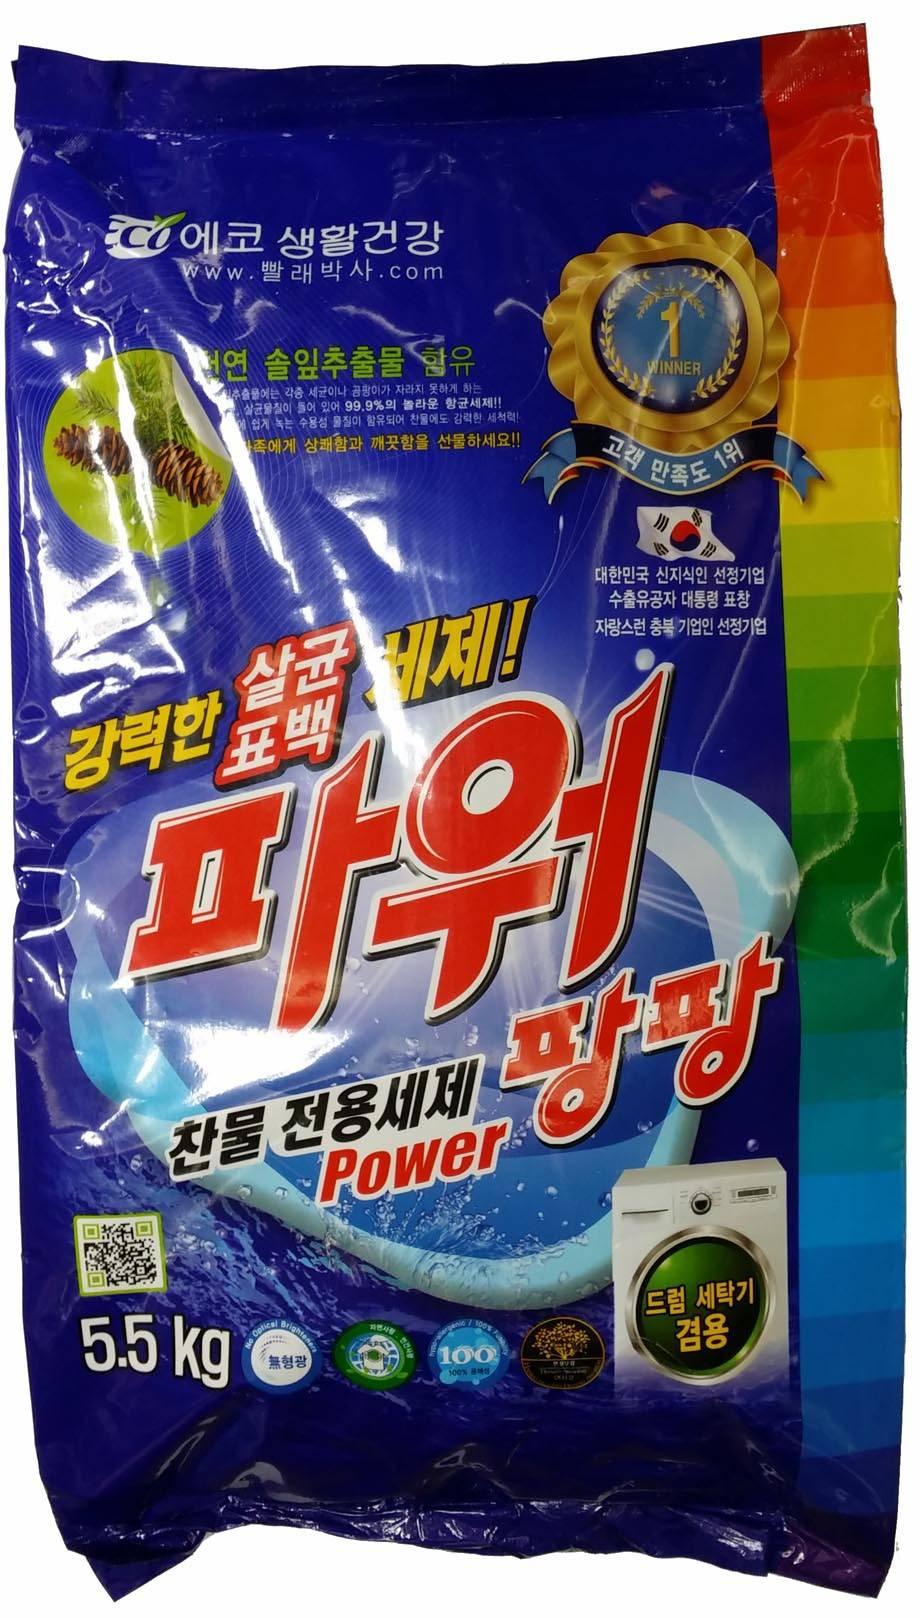 Power PangPang (Powdered Detergent)